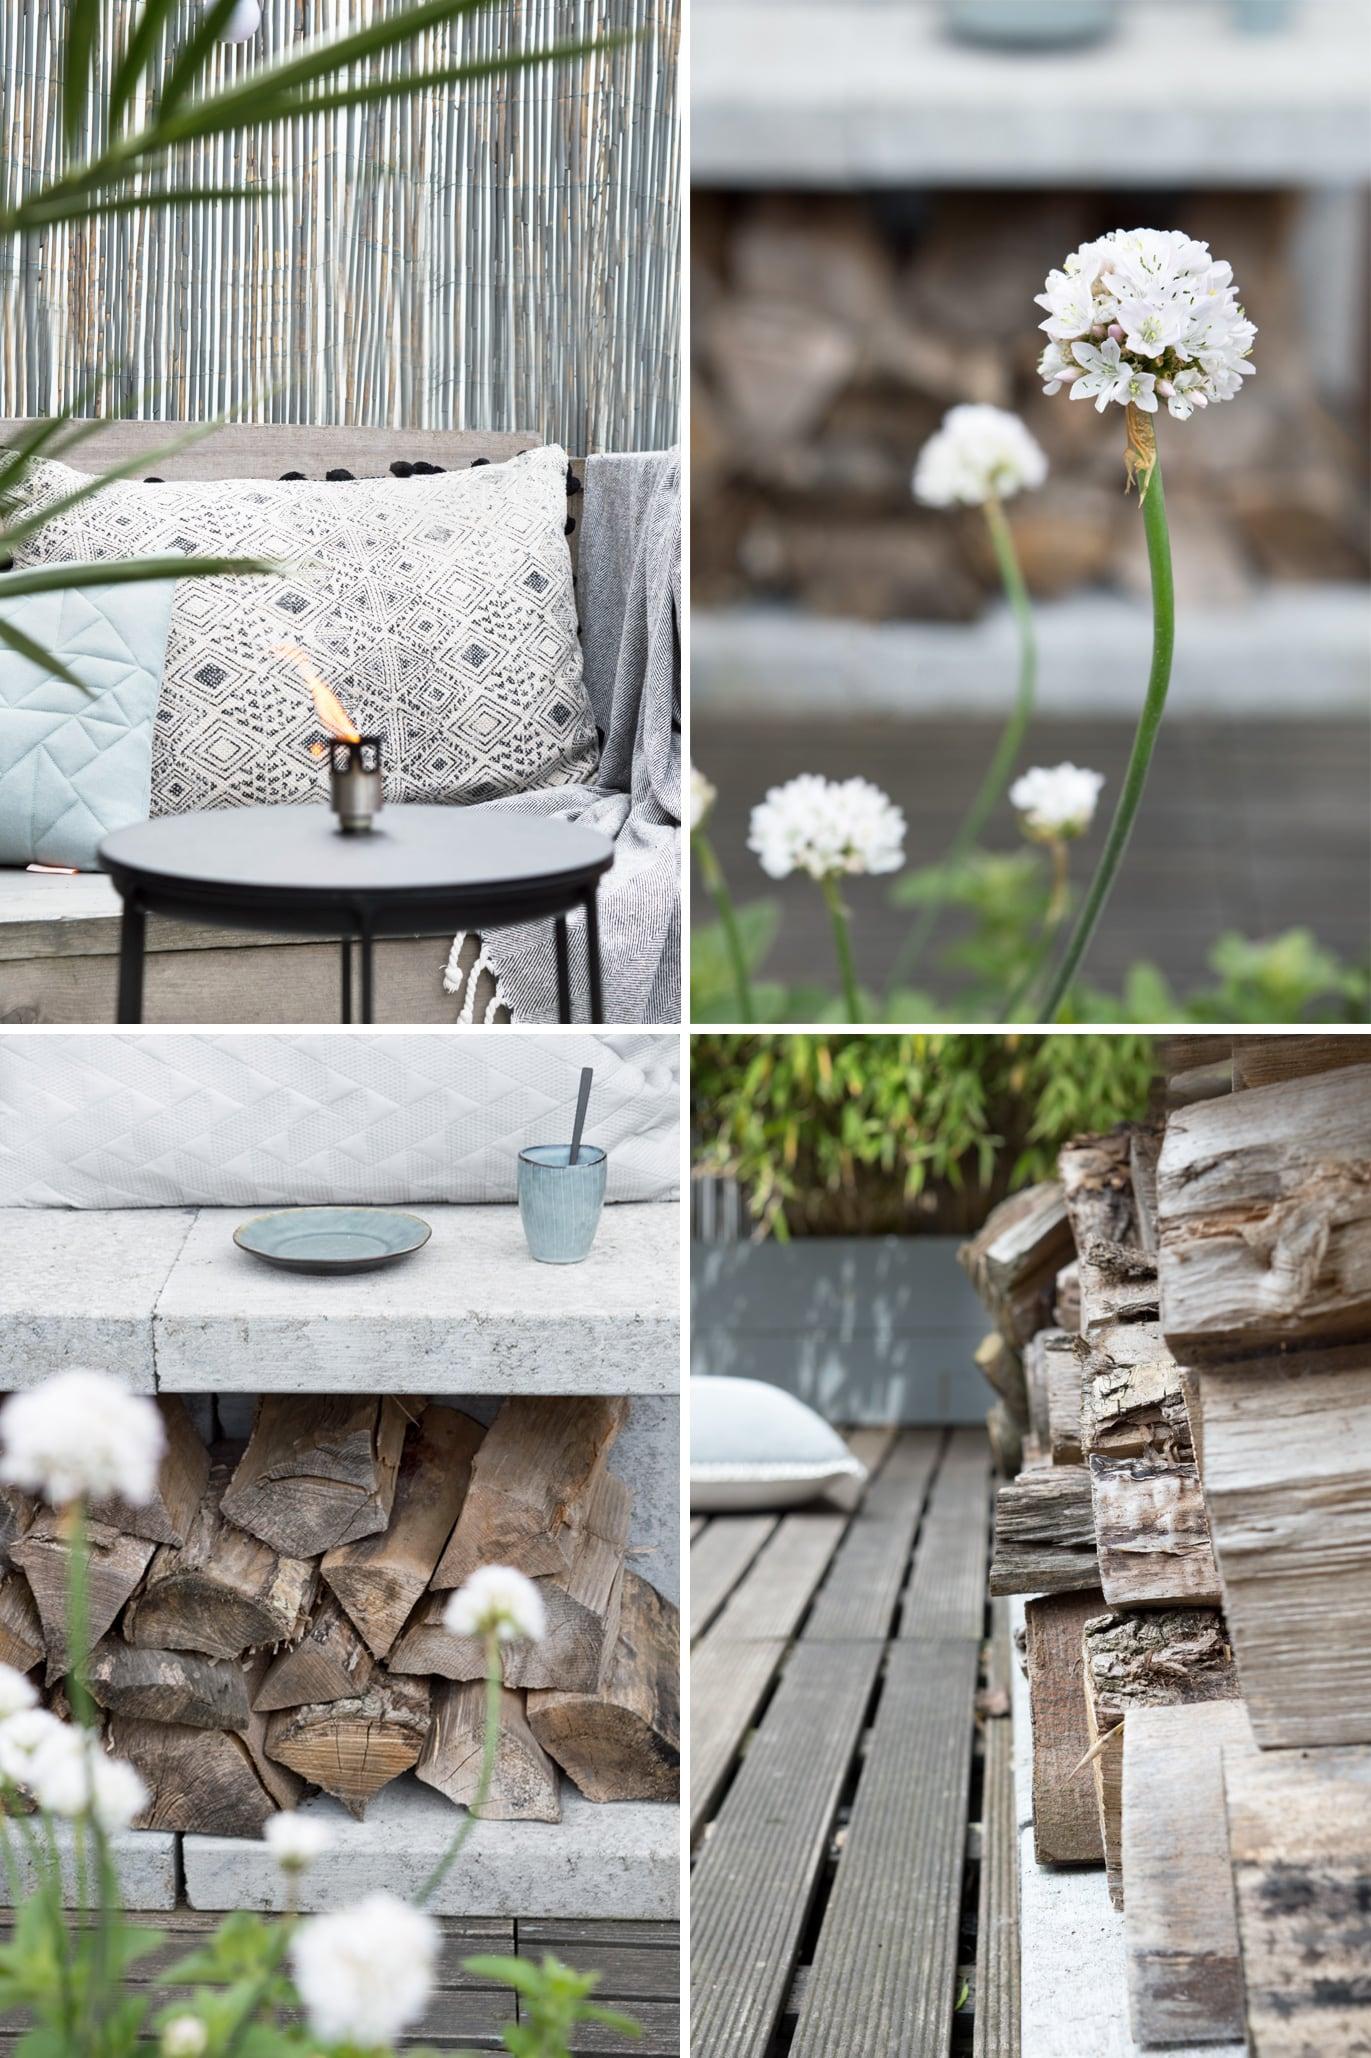 Plantjes op dakterras - Tanja van Hoogdalem